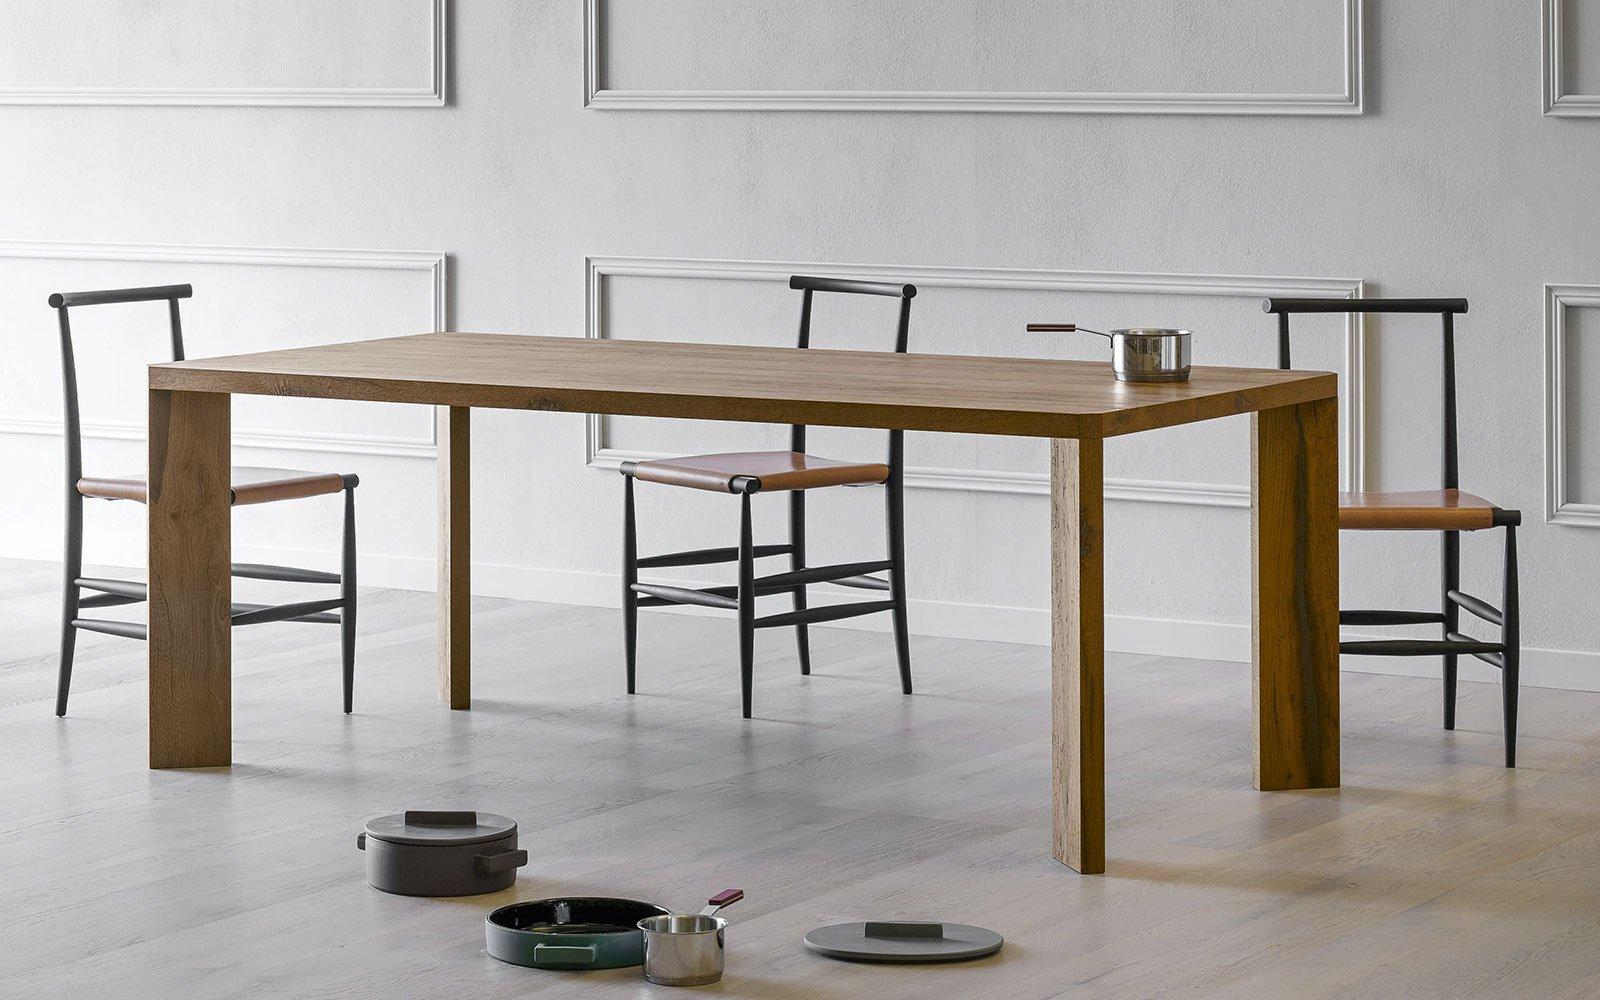 Manero modern dining table